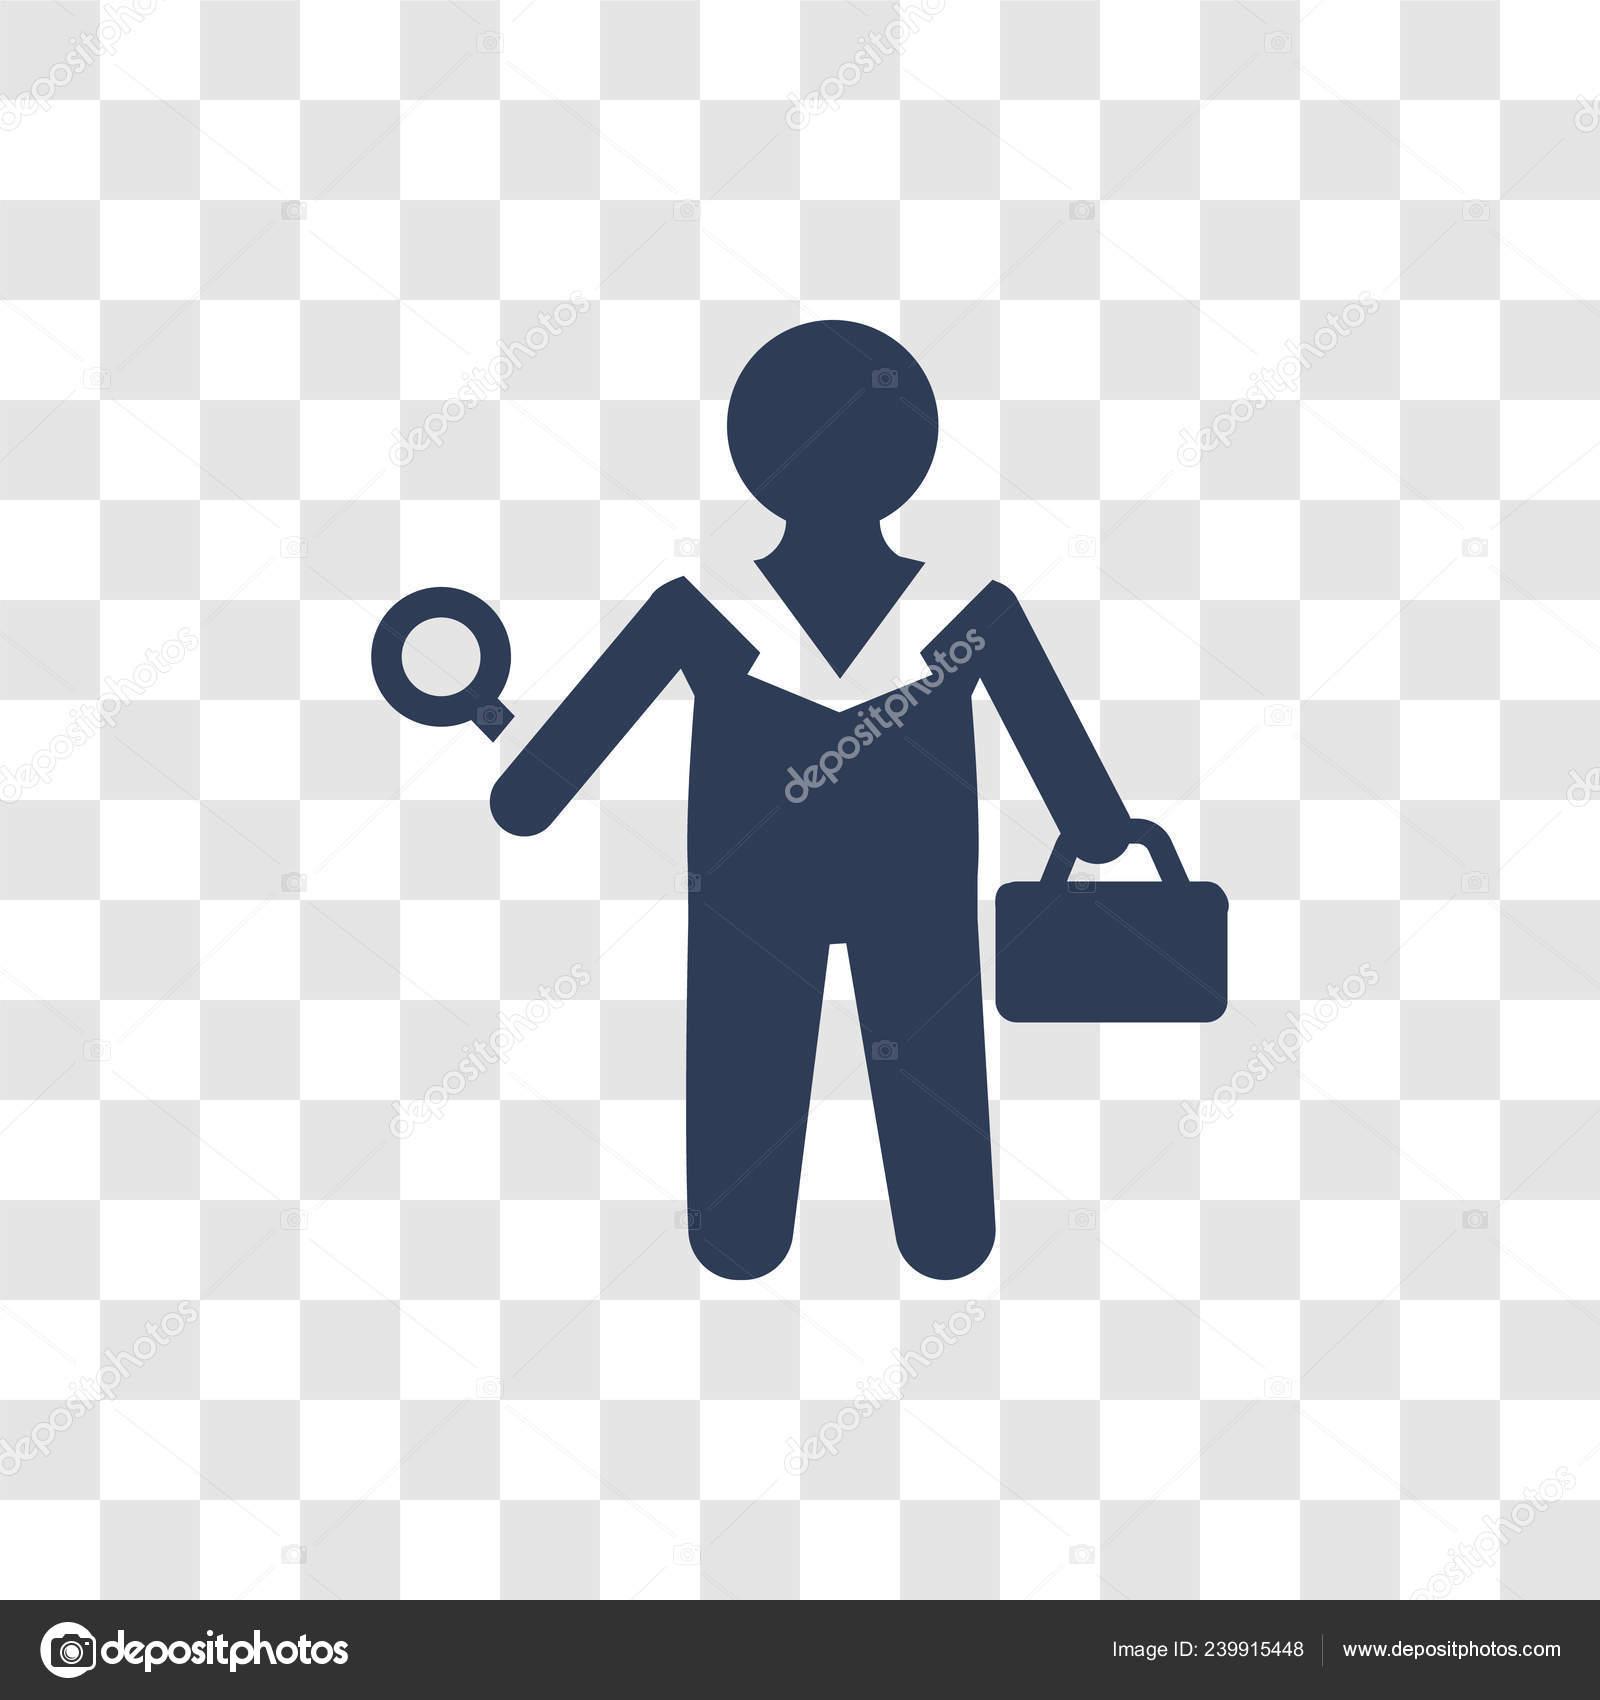 Specialist Icon Trendy Specialist Logo Concept Transparent Background Professions Collection Stock Vector C Bestvectorstock 239915448